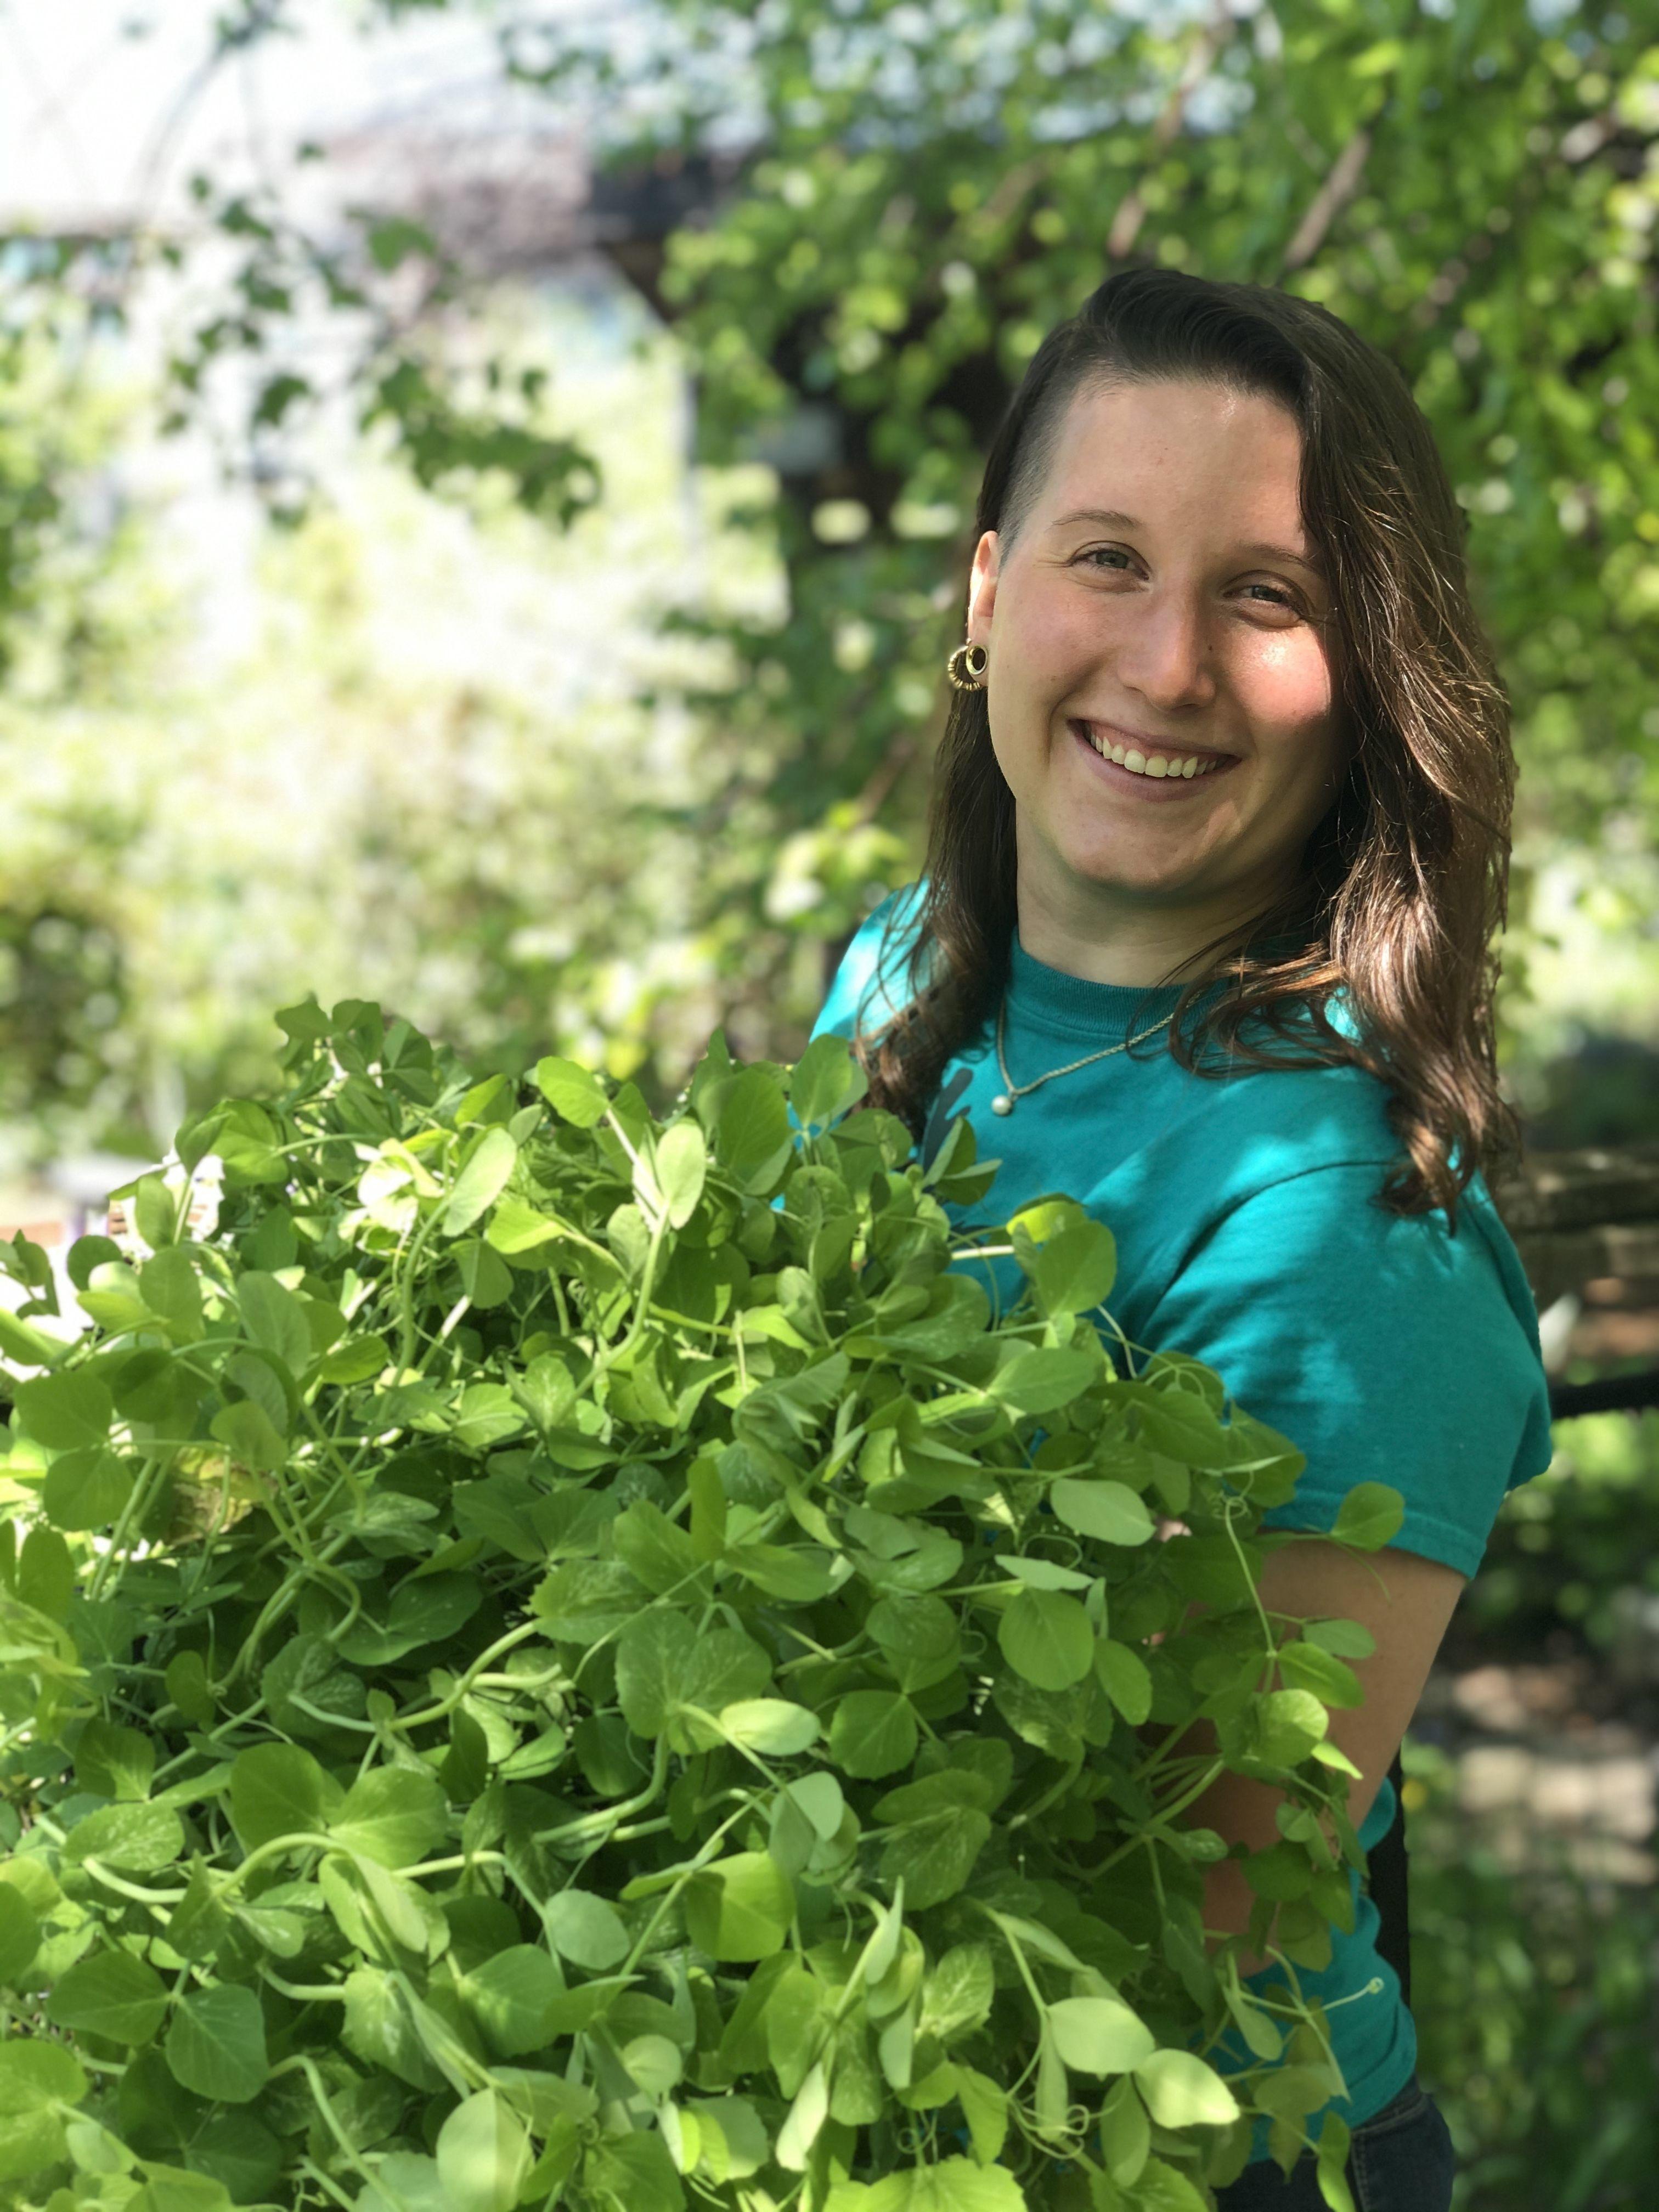 Assistant Urban Farmer